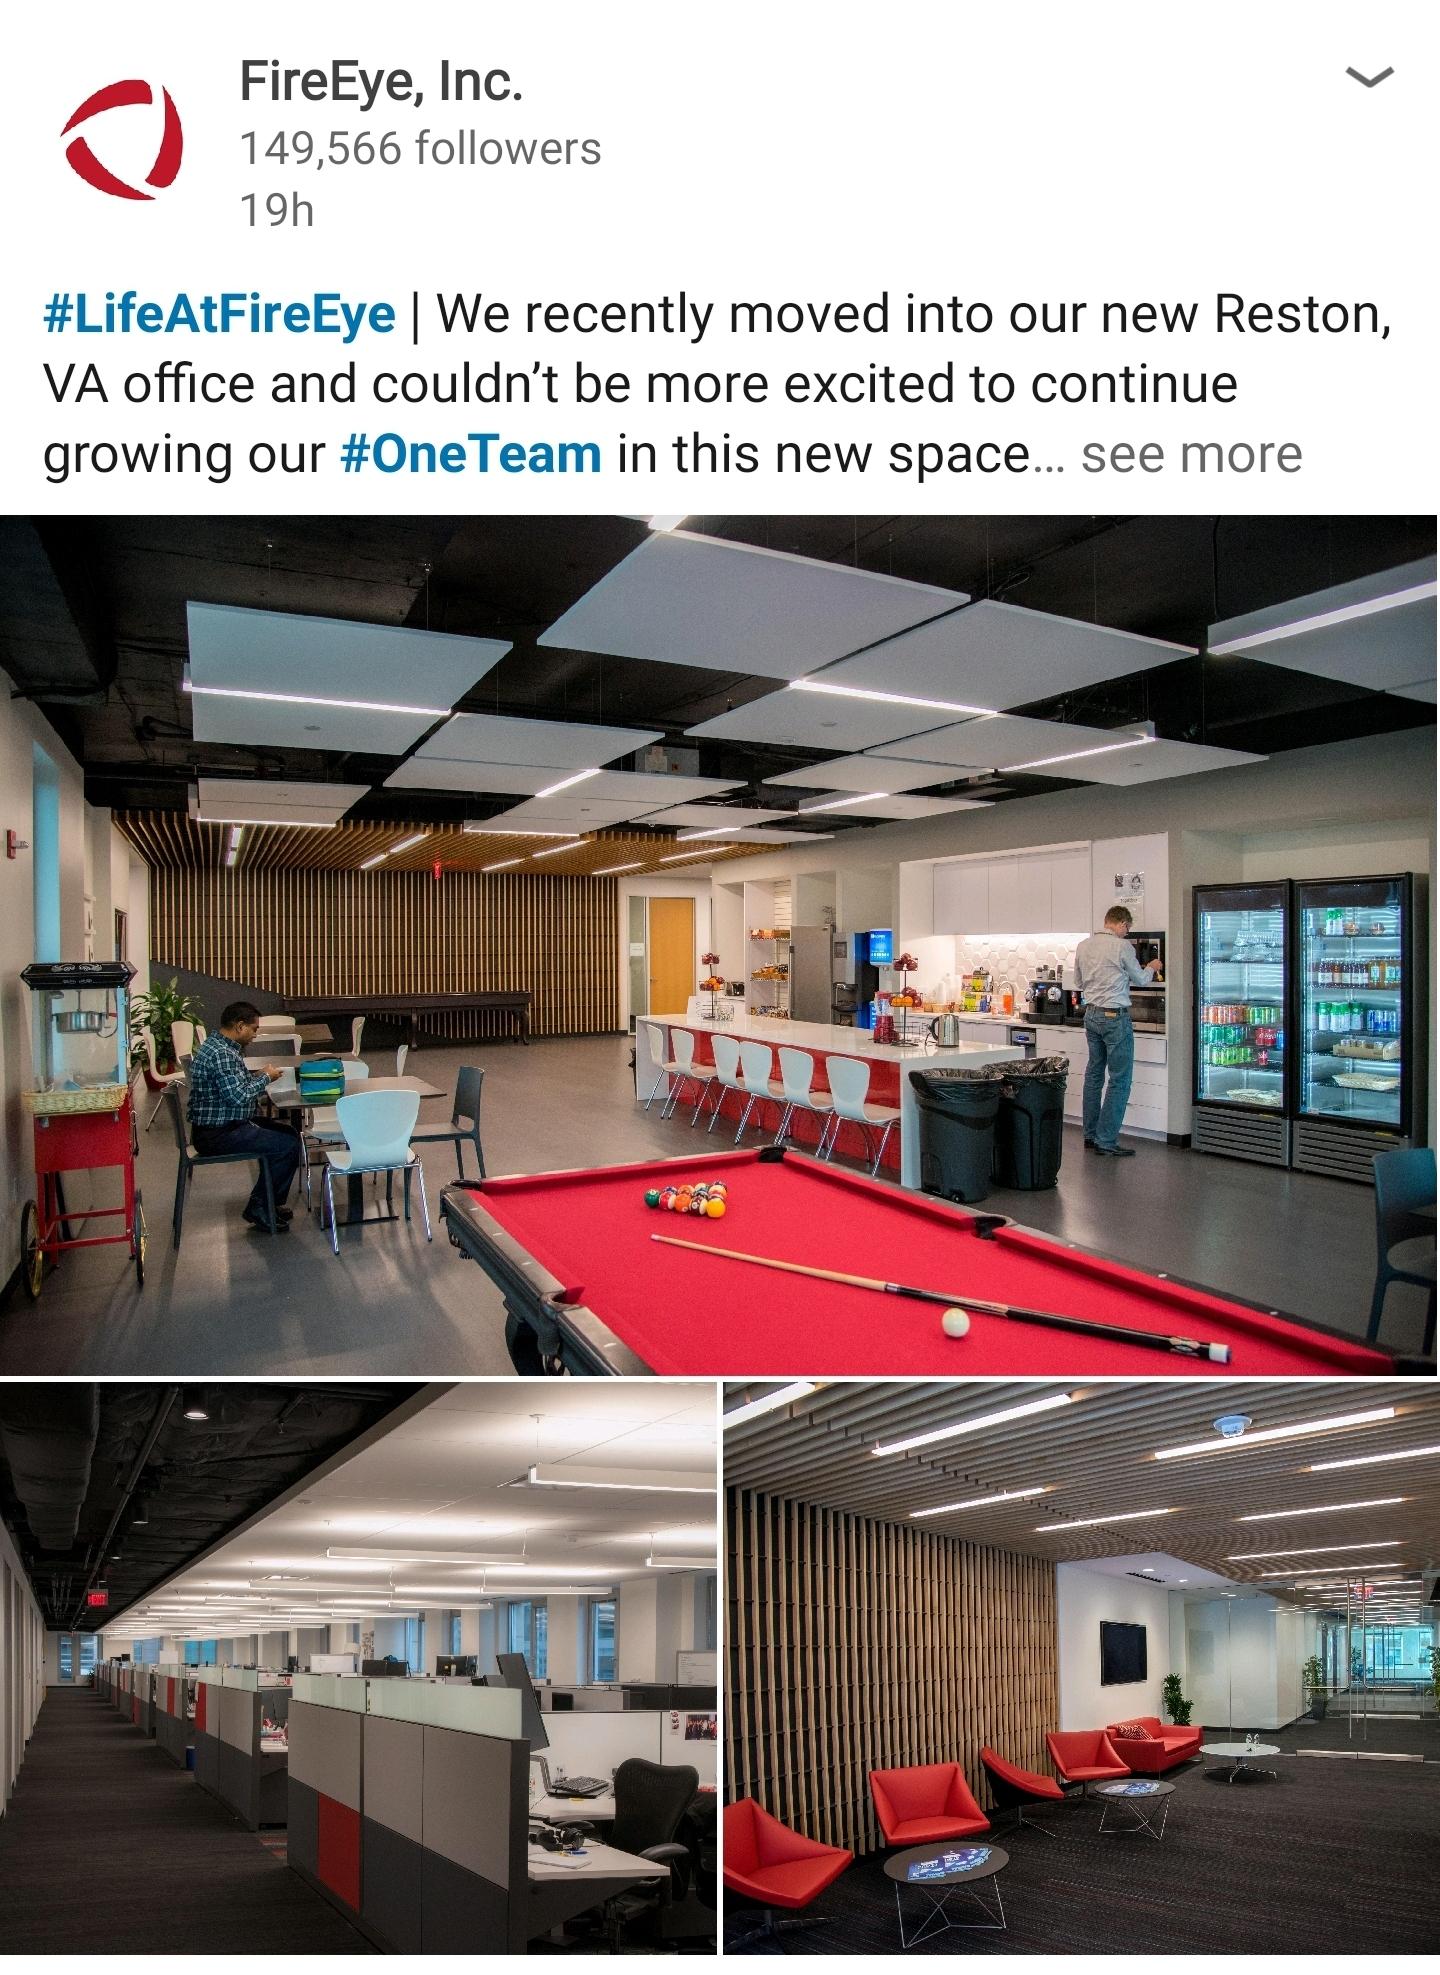 FireEye new Reston, VA office